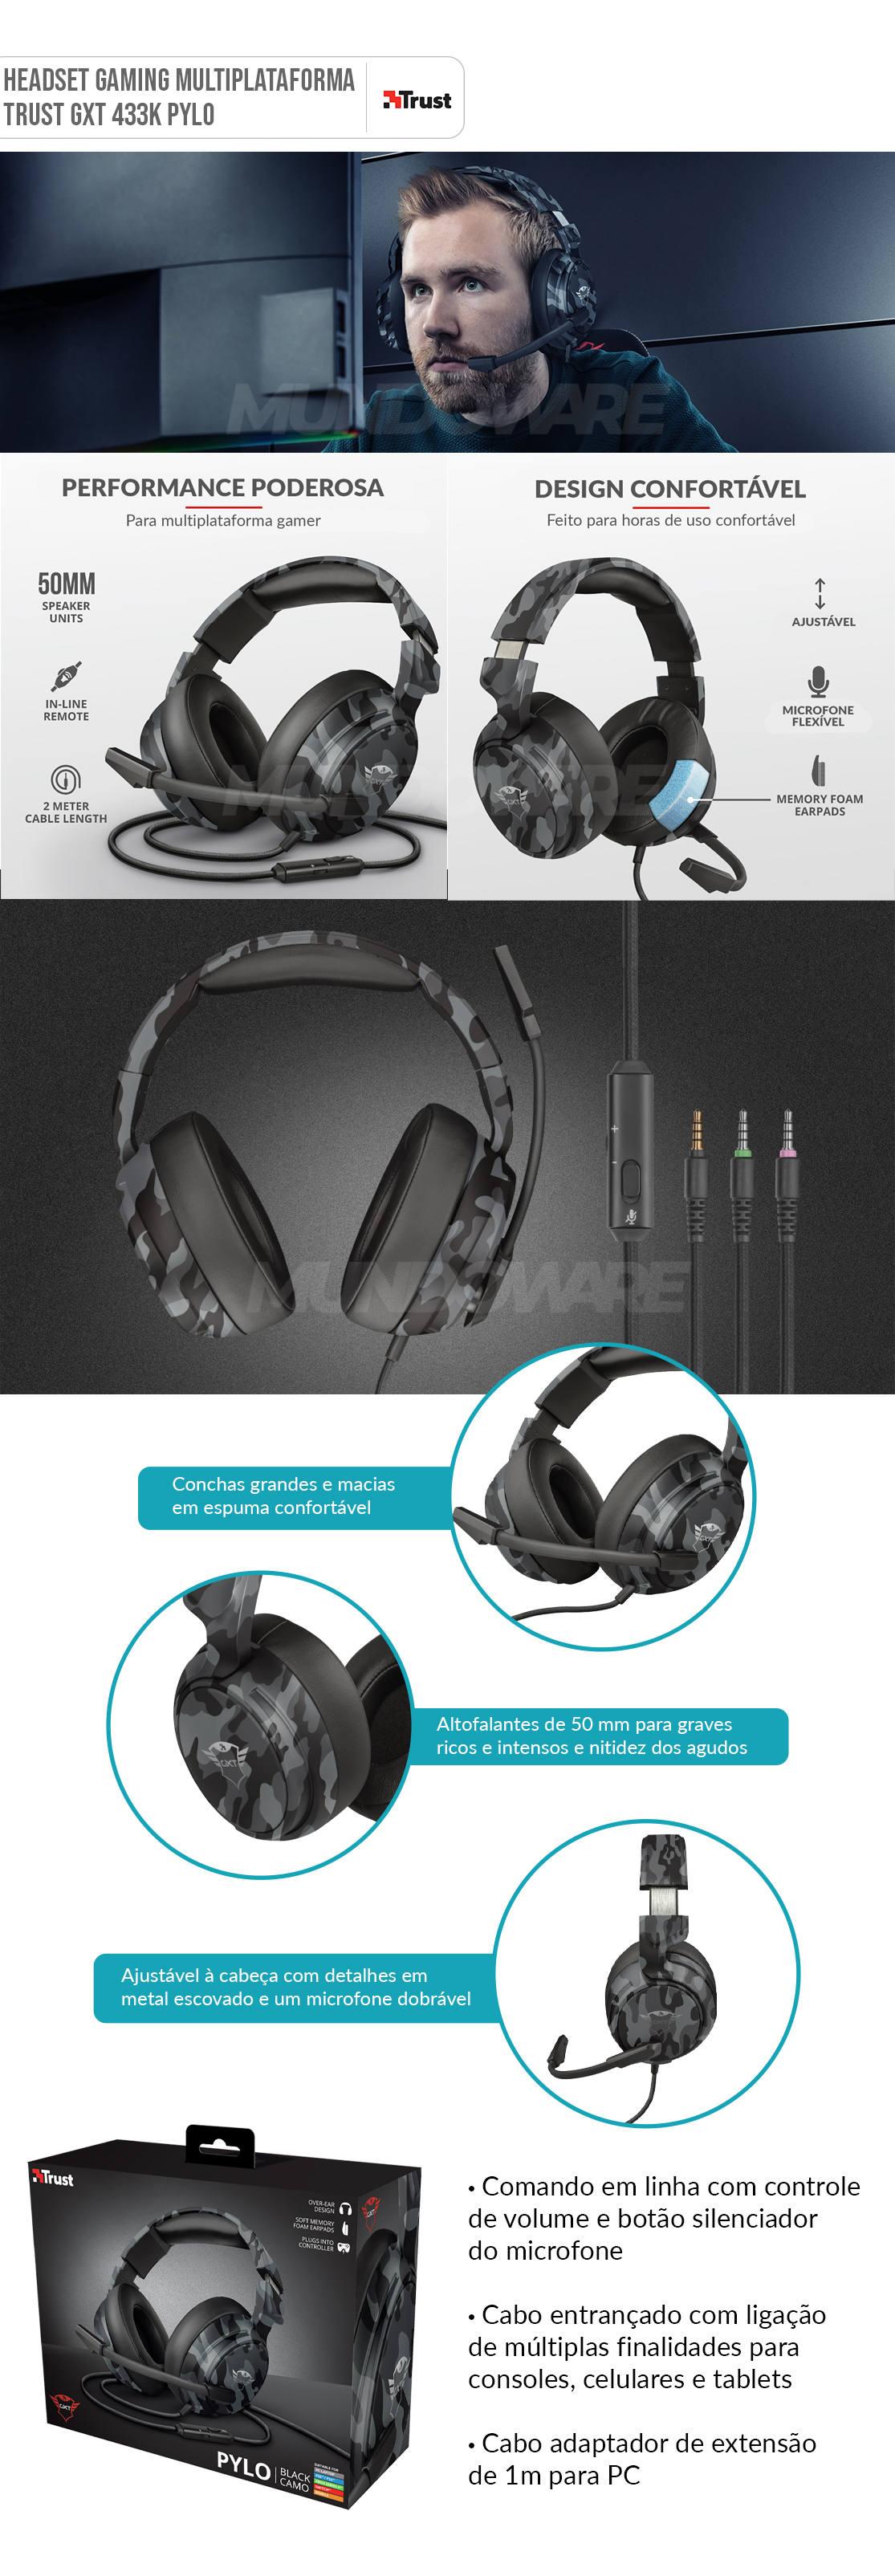 Fone de Ouvido Gamer Multiplataforma Over-Ear Microfone Dobrável Trust GXT 433K Pylo Headset Camo Black